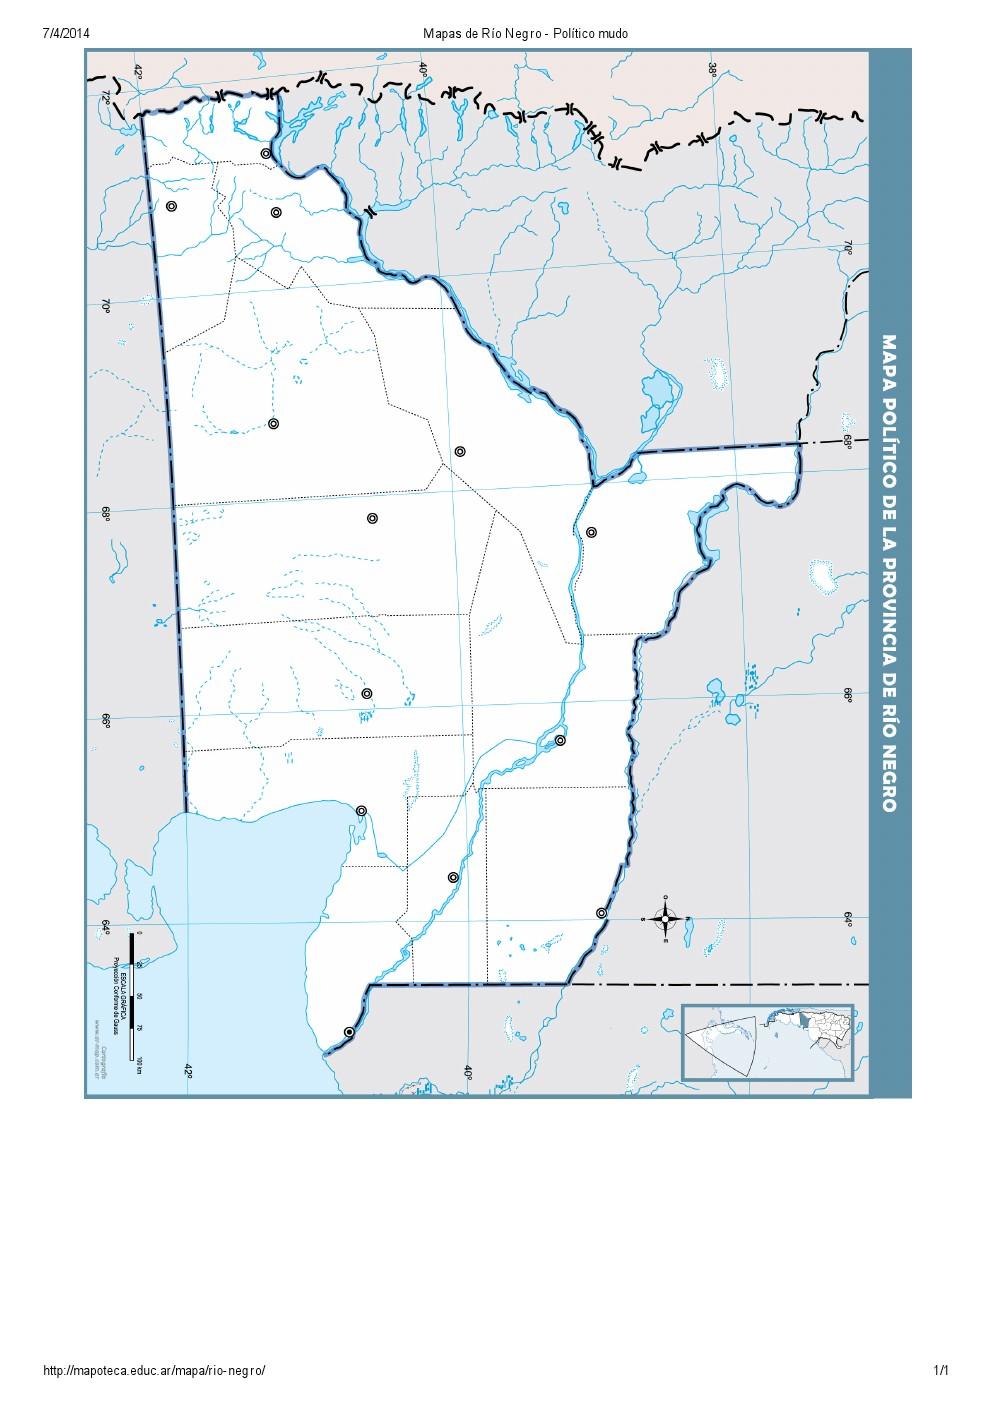 Mapa mudo de capitales de Río Negro. Mapoteca de Educ.ar